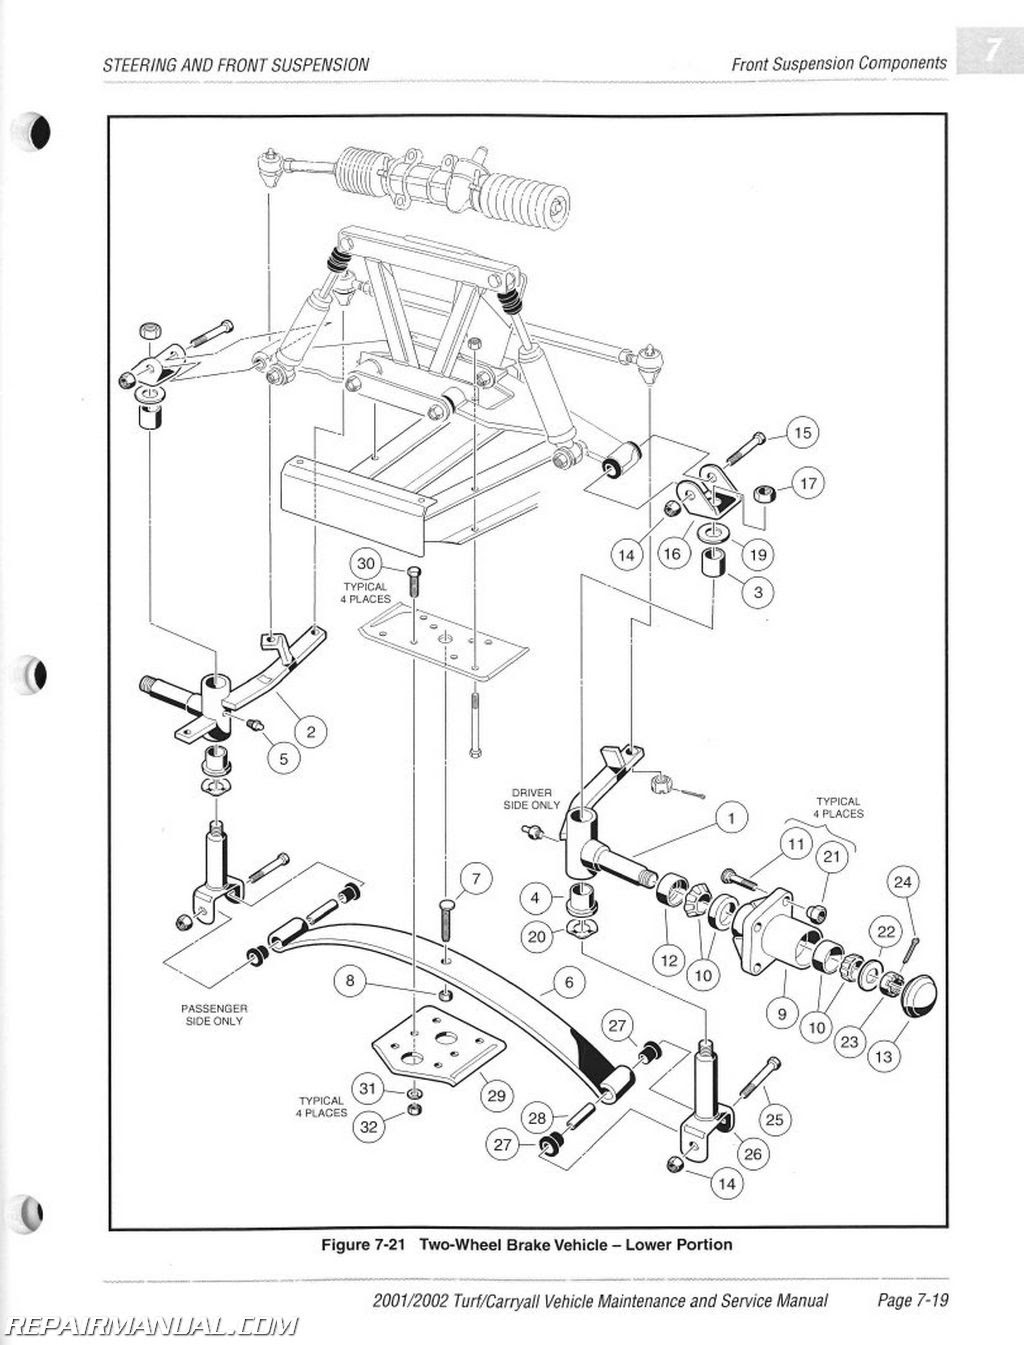 Diagram Club Car Carry All 2 Parts Diagram Full Version Hd Quality Parts Diagram Sitexadell Dabliusound It